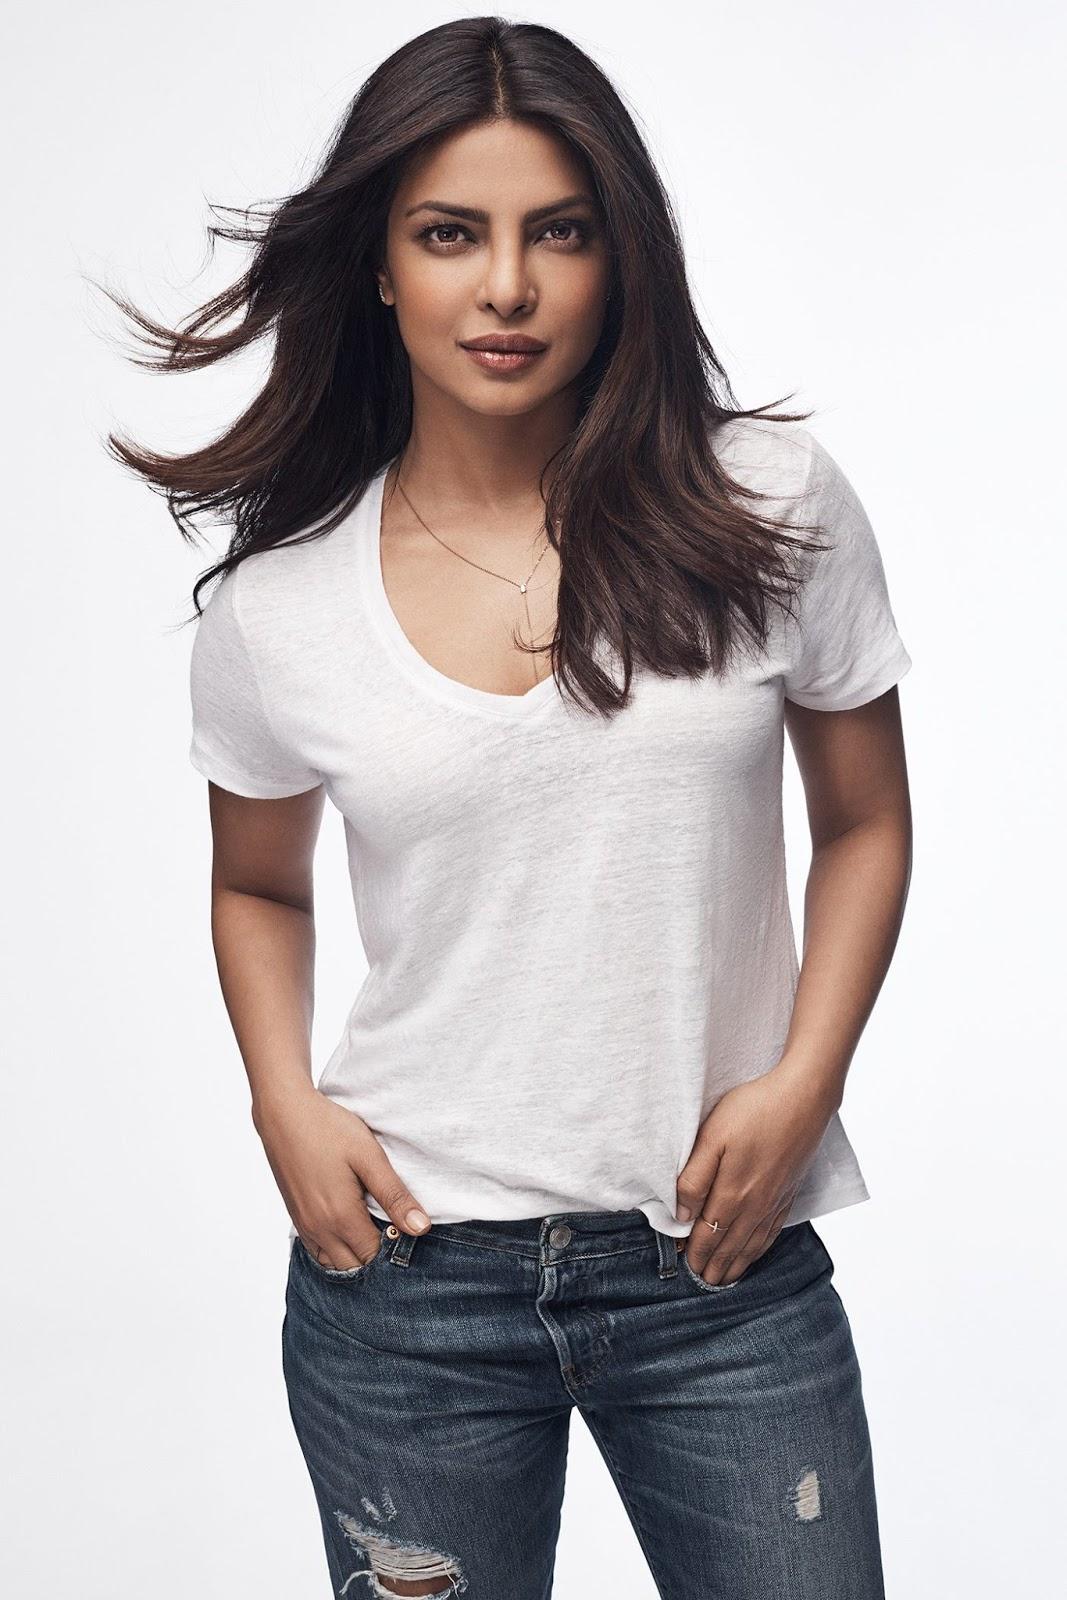 priyanka chopra 21 best hd photos download - indian celebrities hd